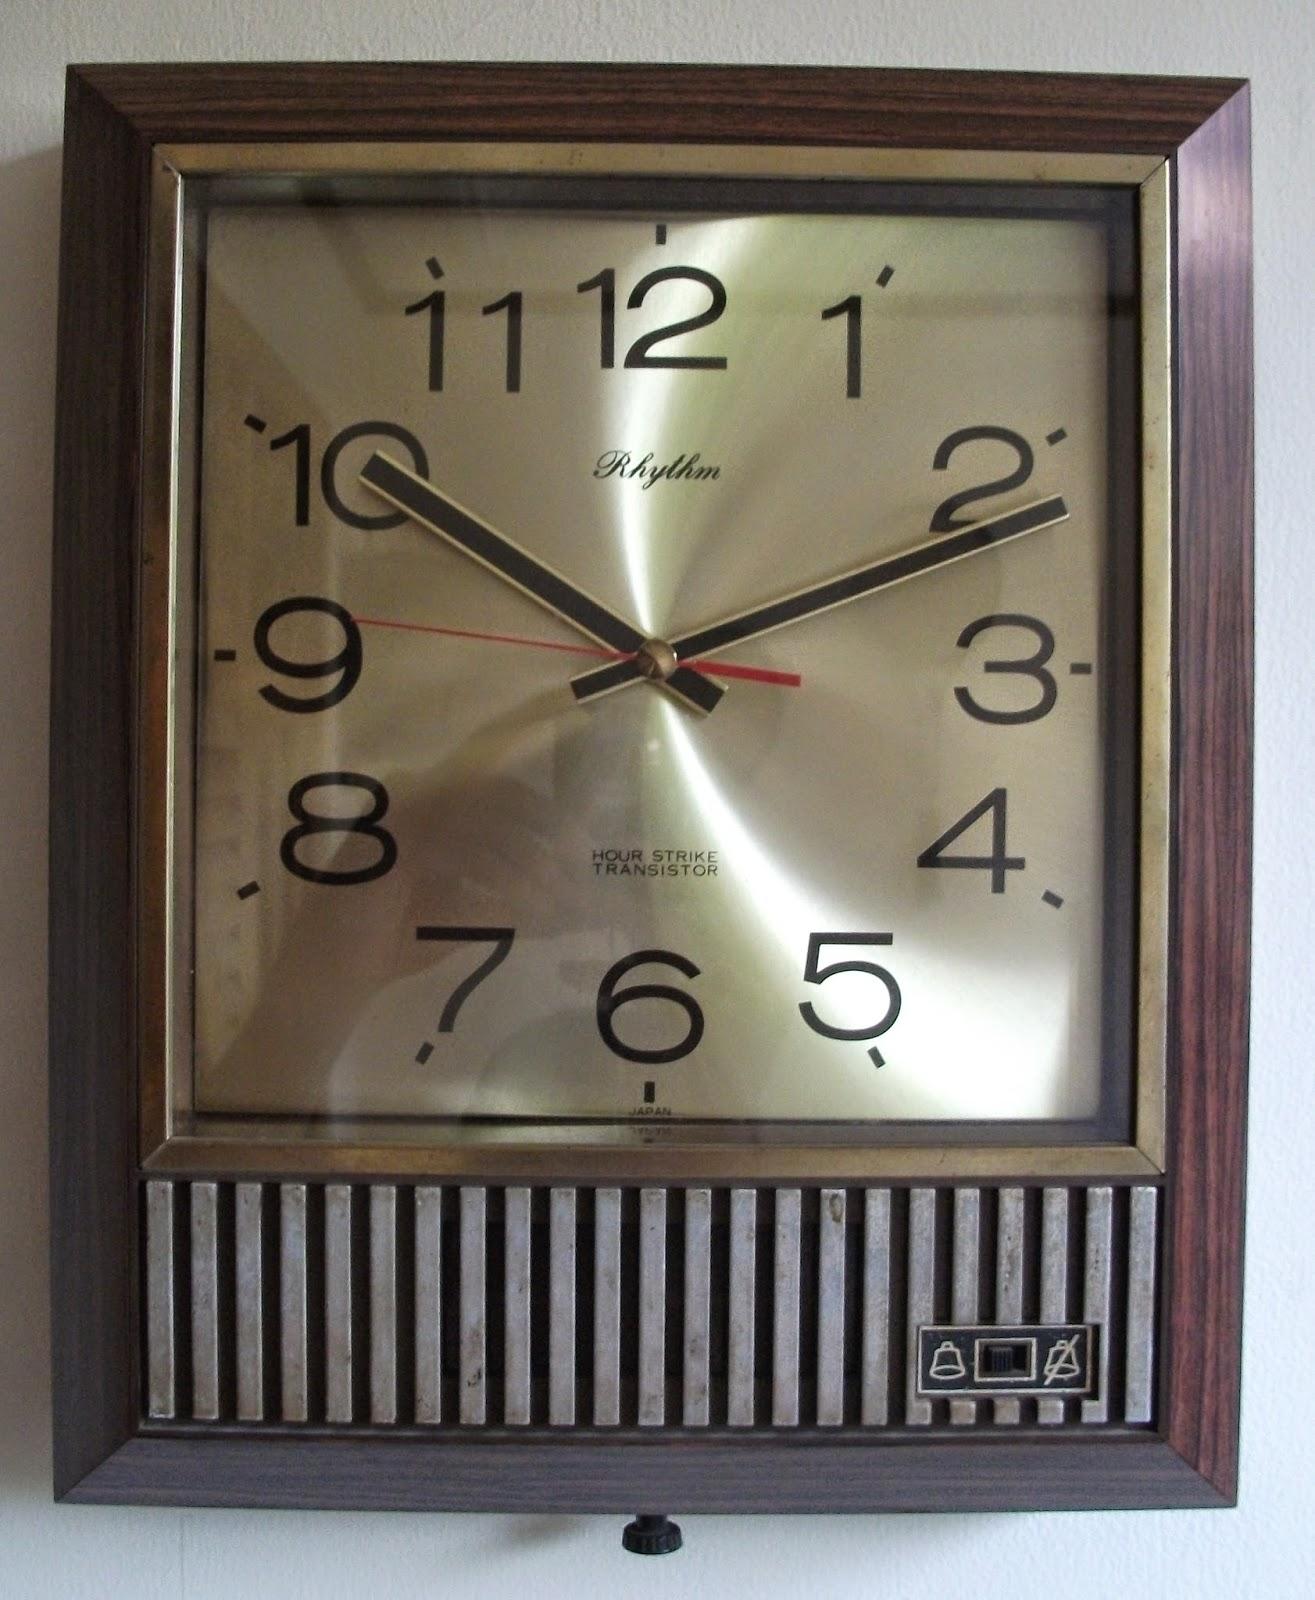 KoleksiKu Barang Jadul  Jam dinding RHYTHM Hour strike Transistor e862810df8